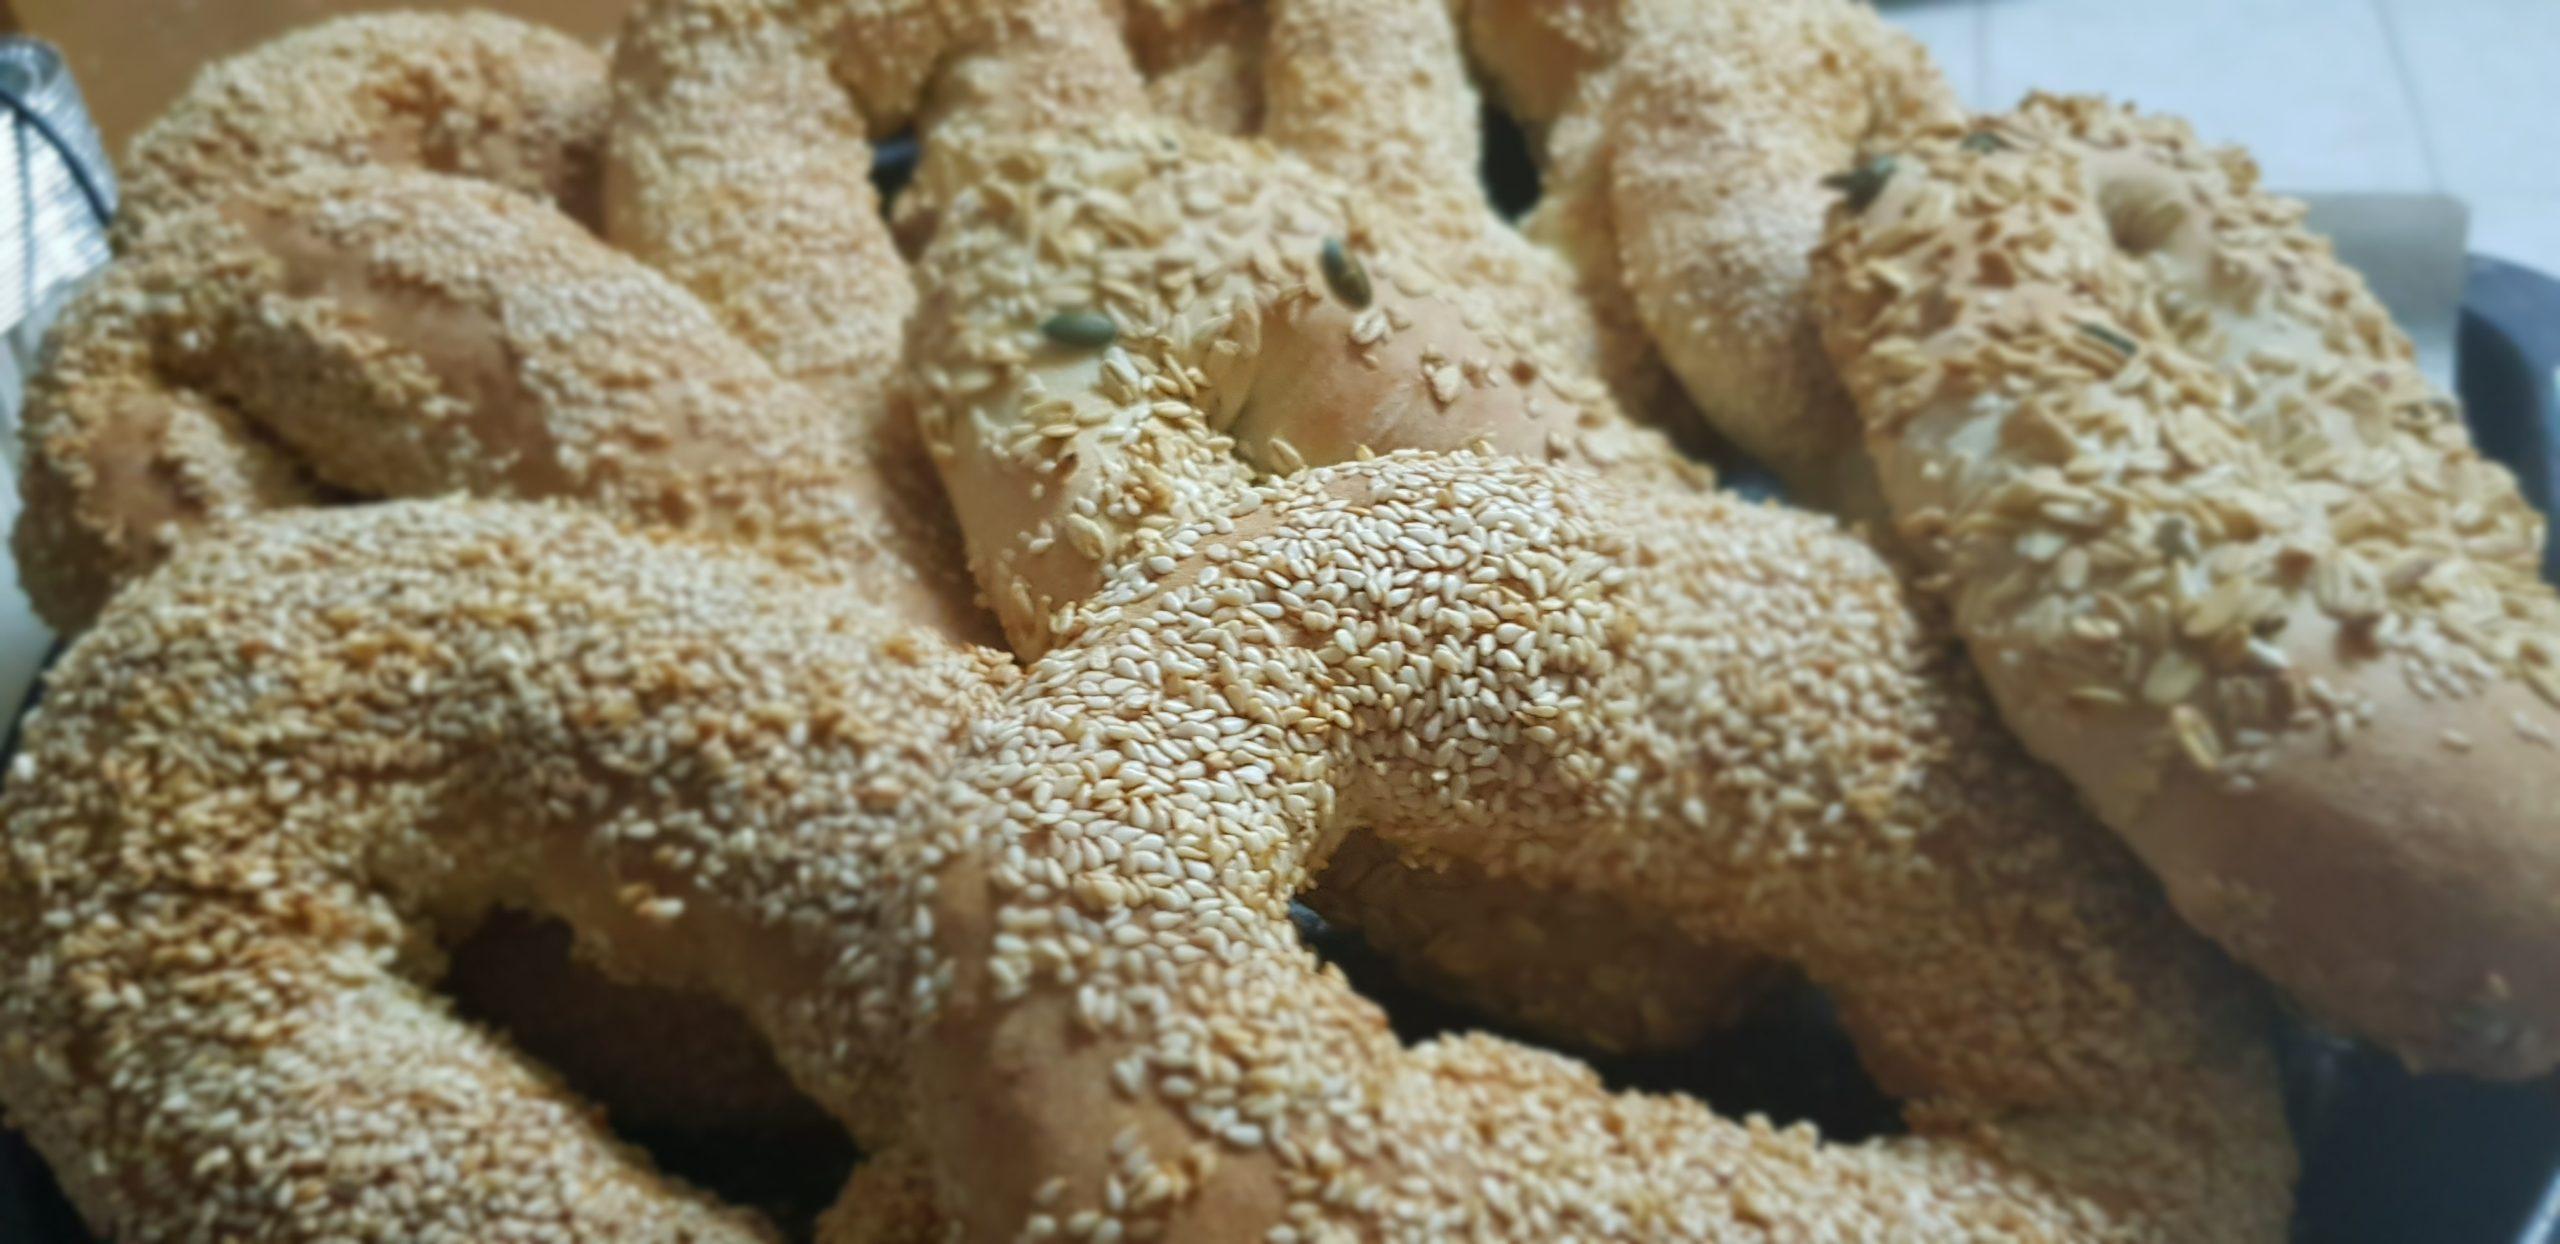 Les bagels de Jérusalem